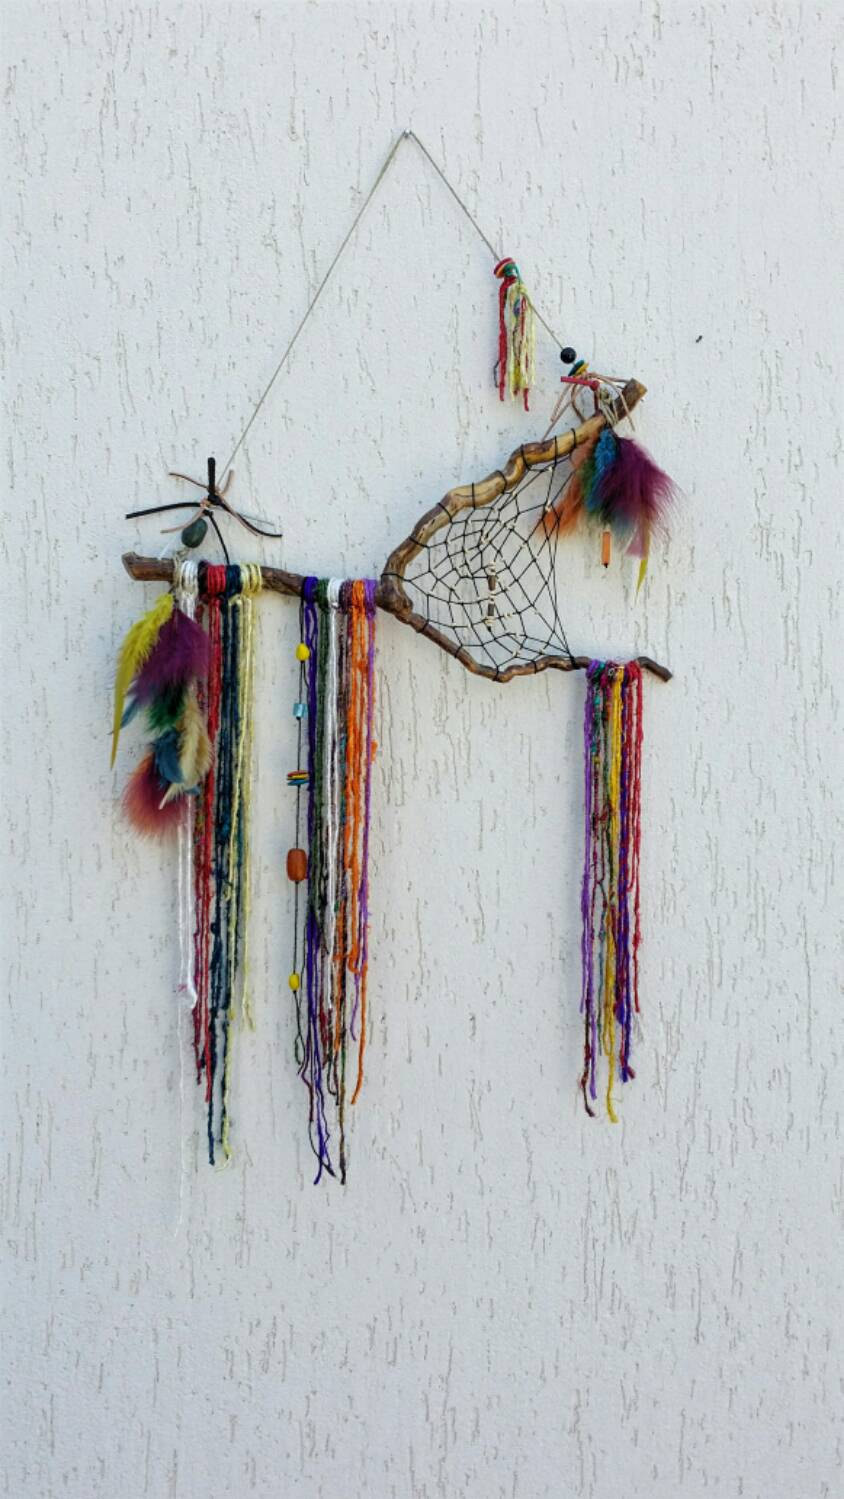 Best ideas about Boho Wall Art . Save or Pin Boho Rustic gypsy décor Gypsy wall art bohemian décor Now.